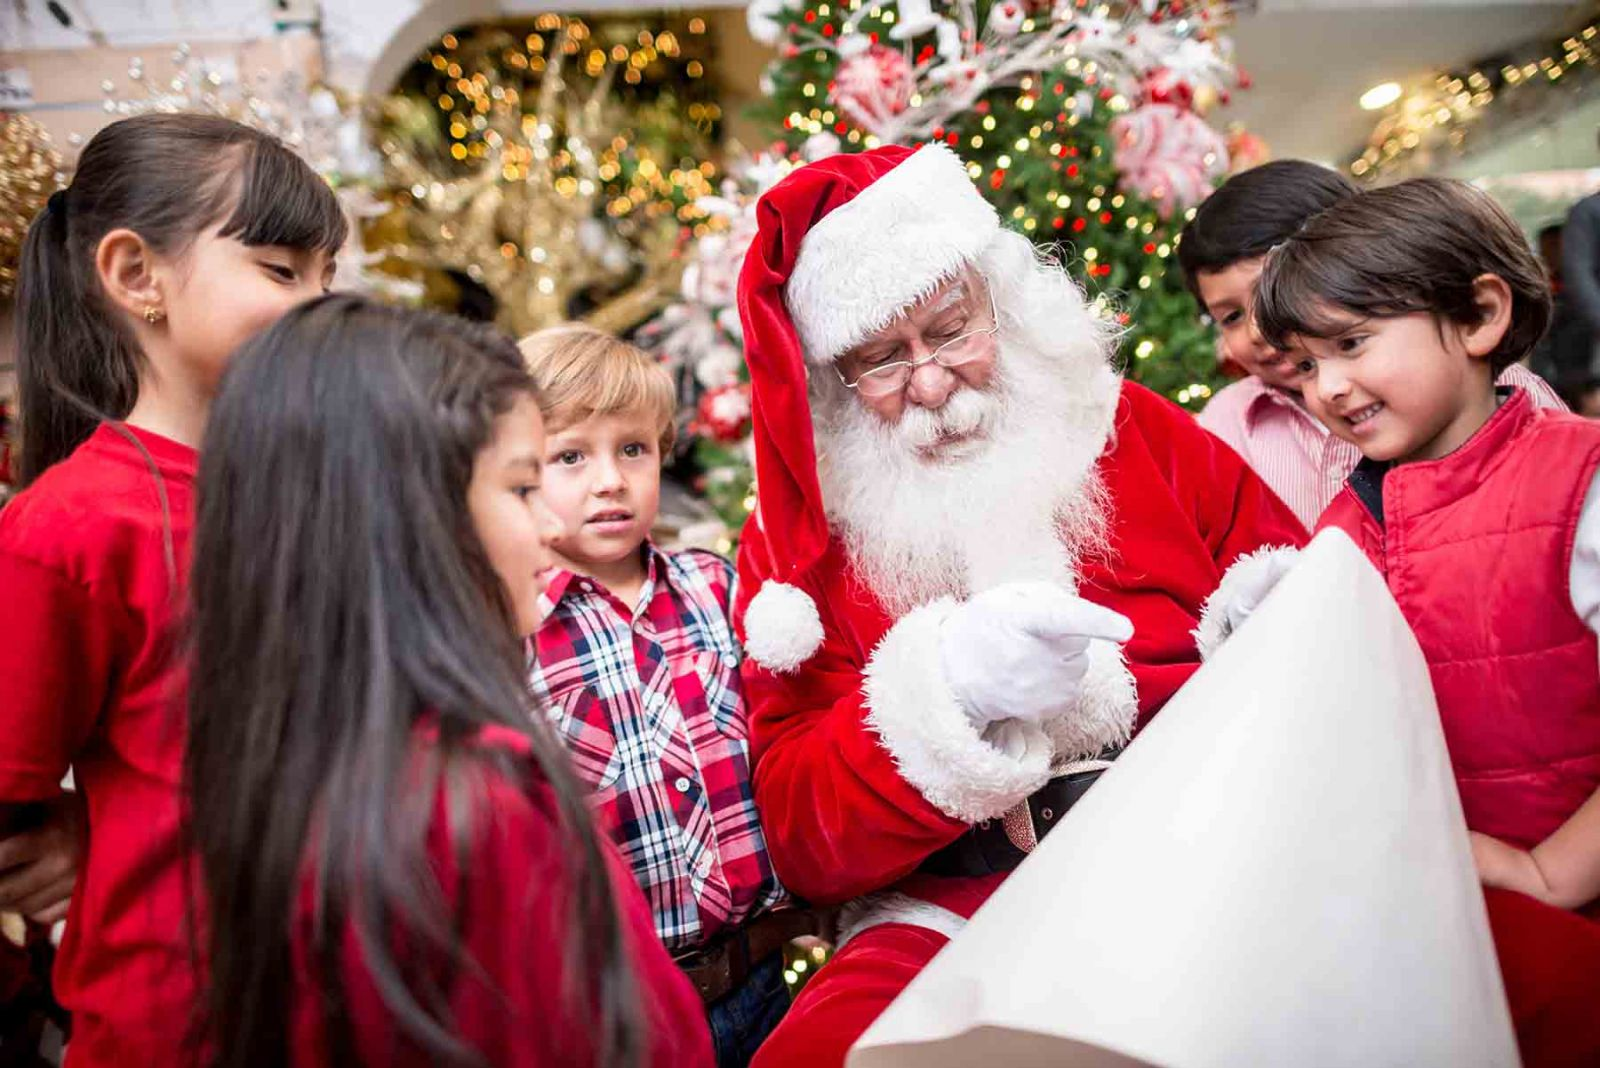 Myrtle Beach Christmas Light Show 2020 The Great Christmas Light Show 2020 | Myrtle Beach Events